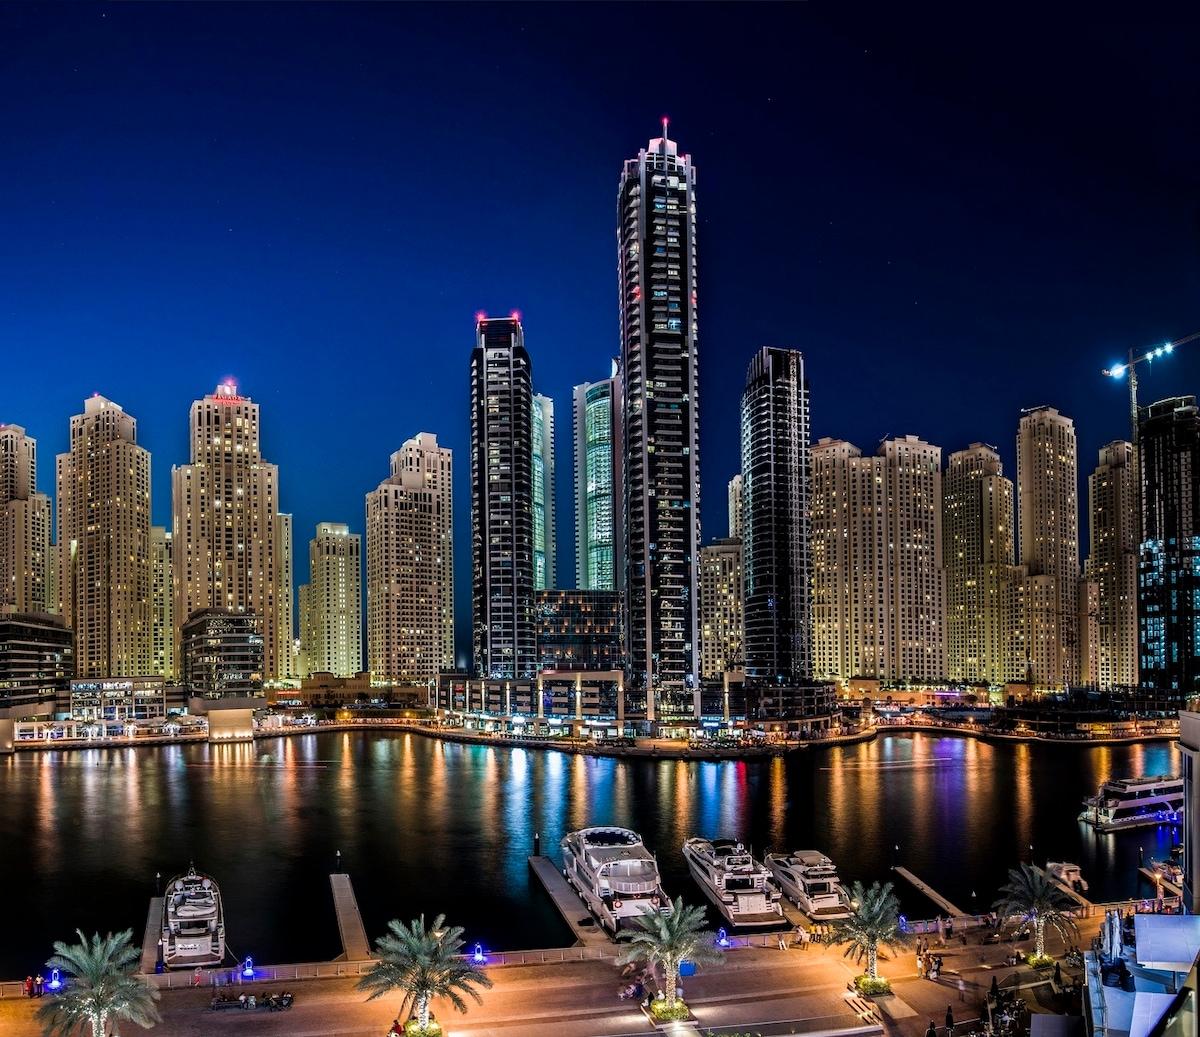 A view of the stunning Dubai Marina at night